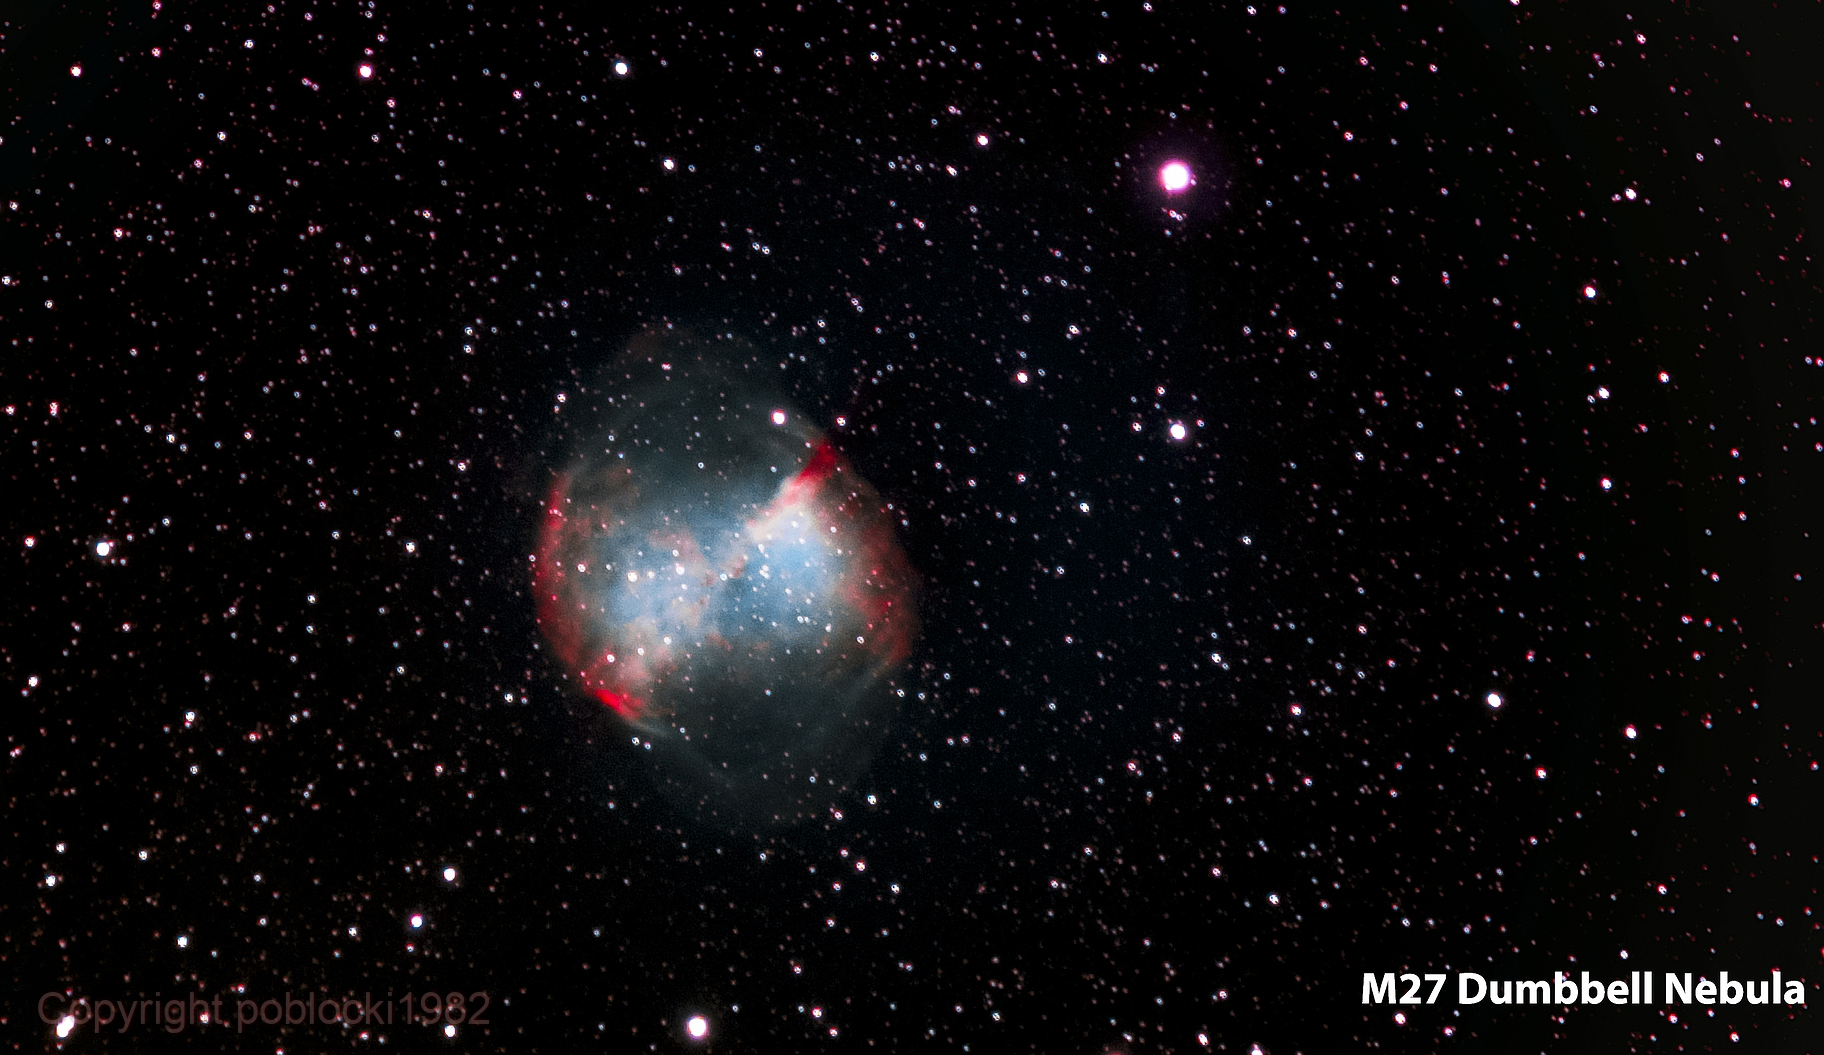 M27 Dumbbell Nebula,                                poblocki1982